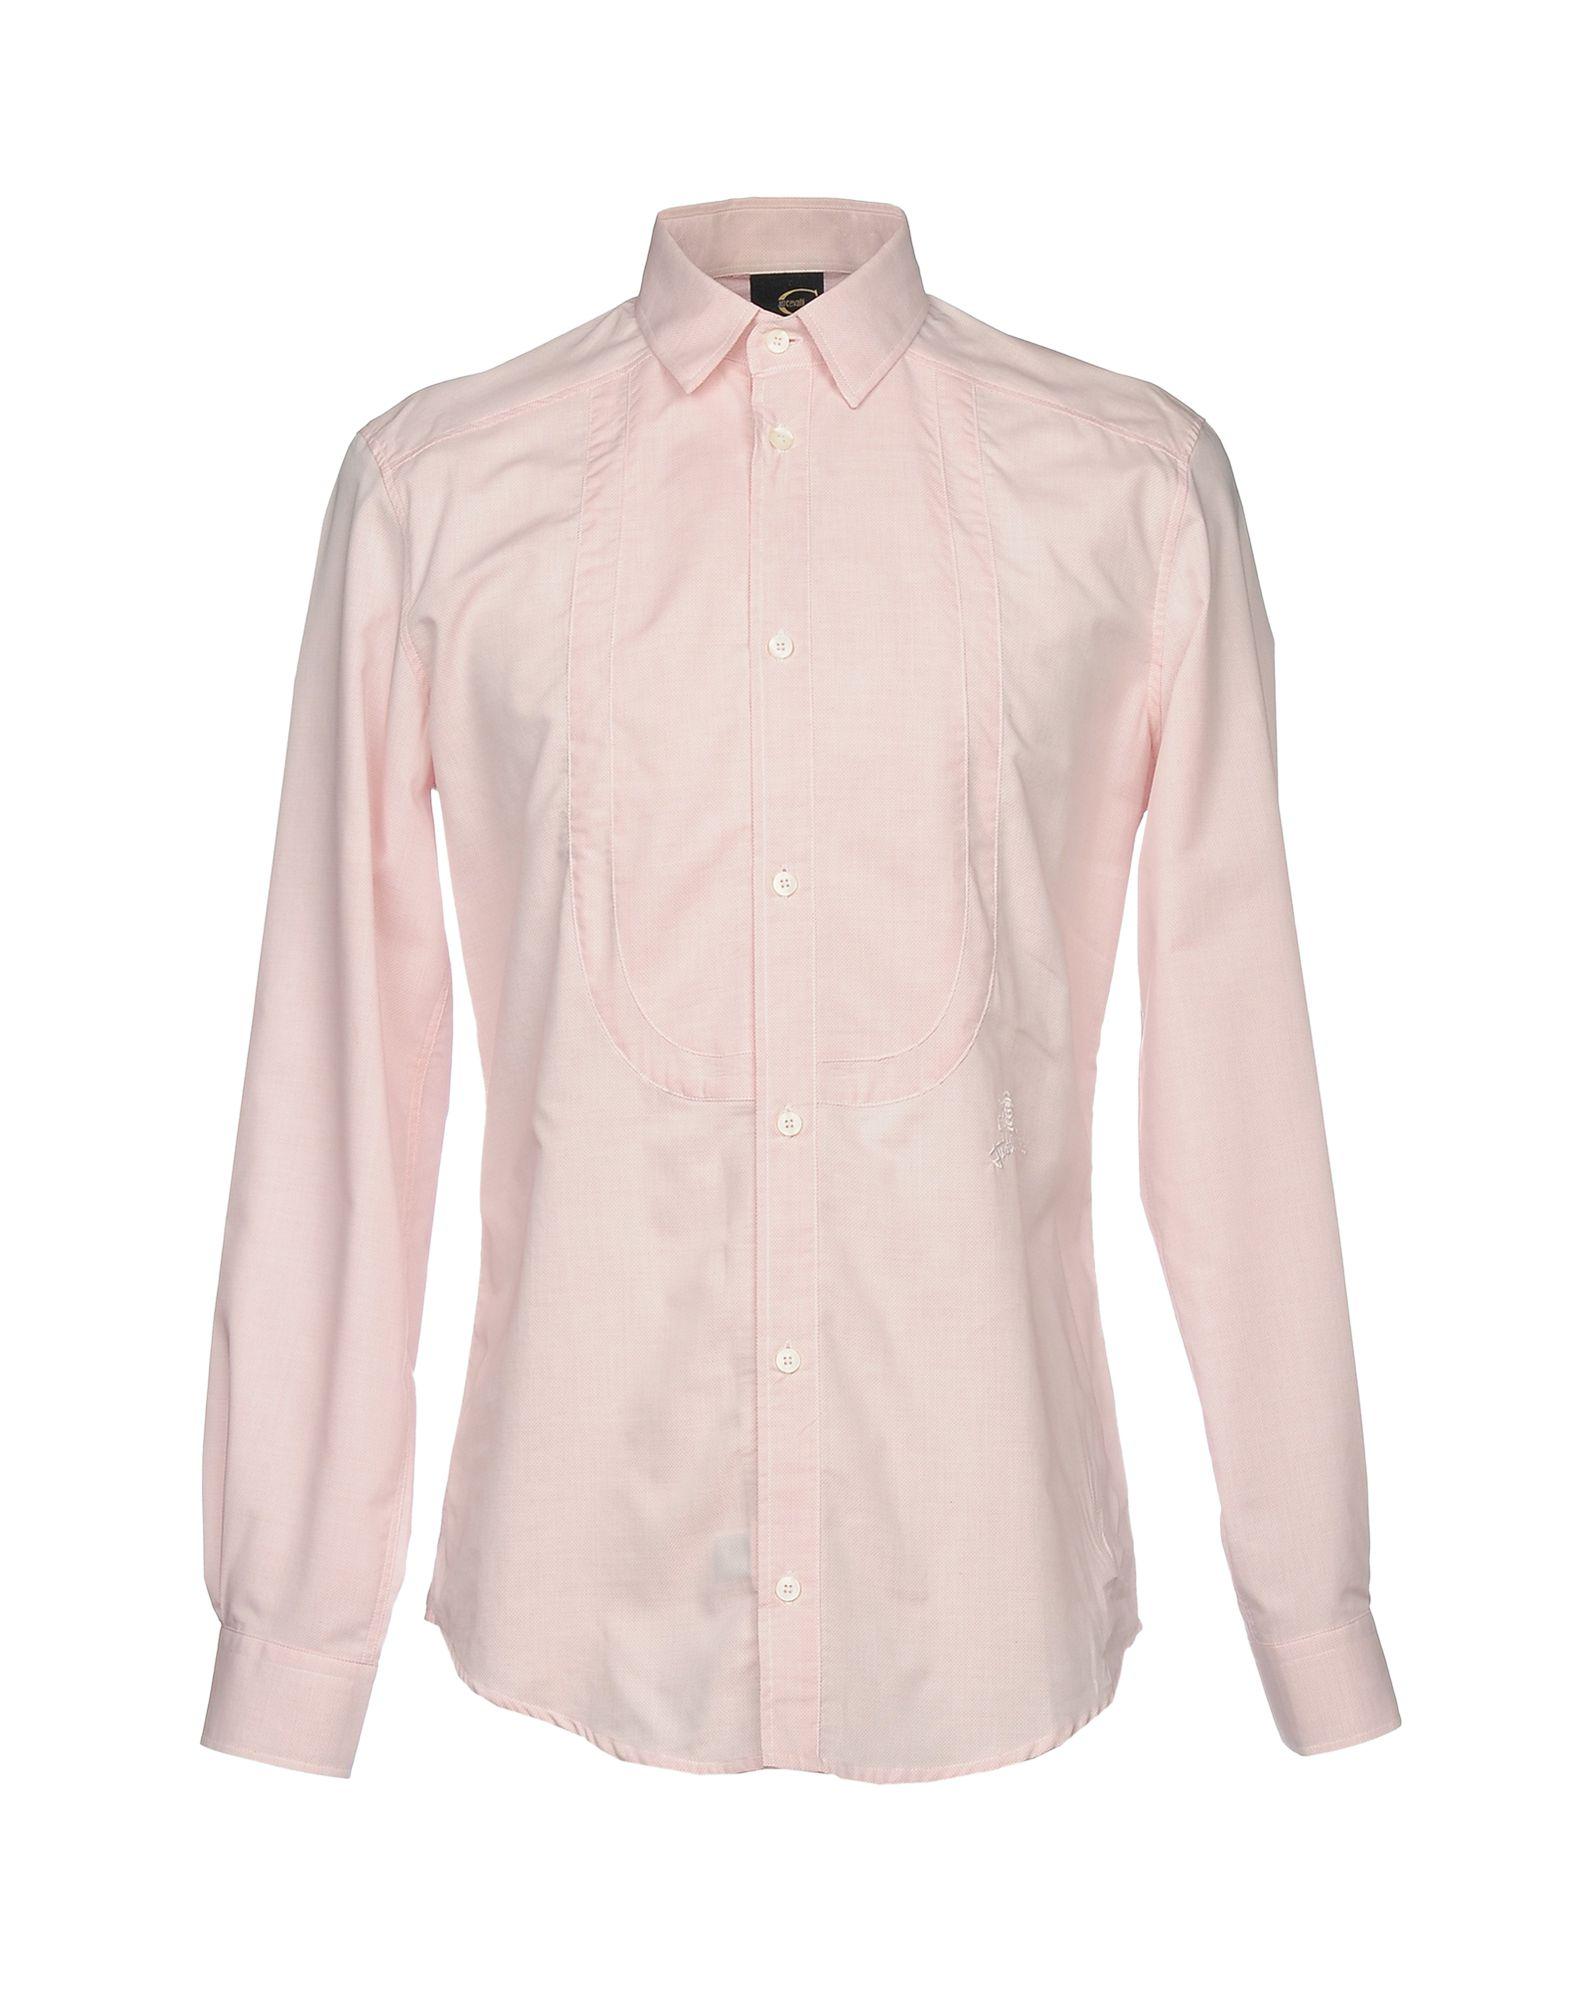 Camicia Fantasia Just Cavalli Uomo - Acquista online su